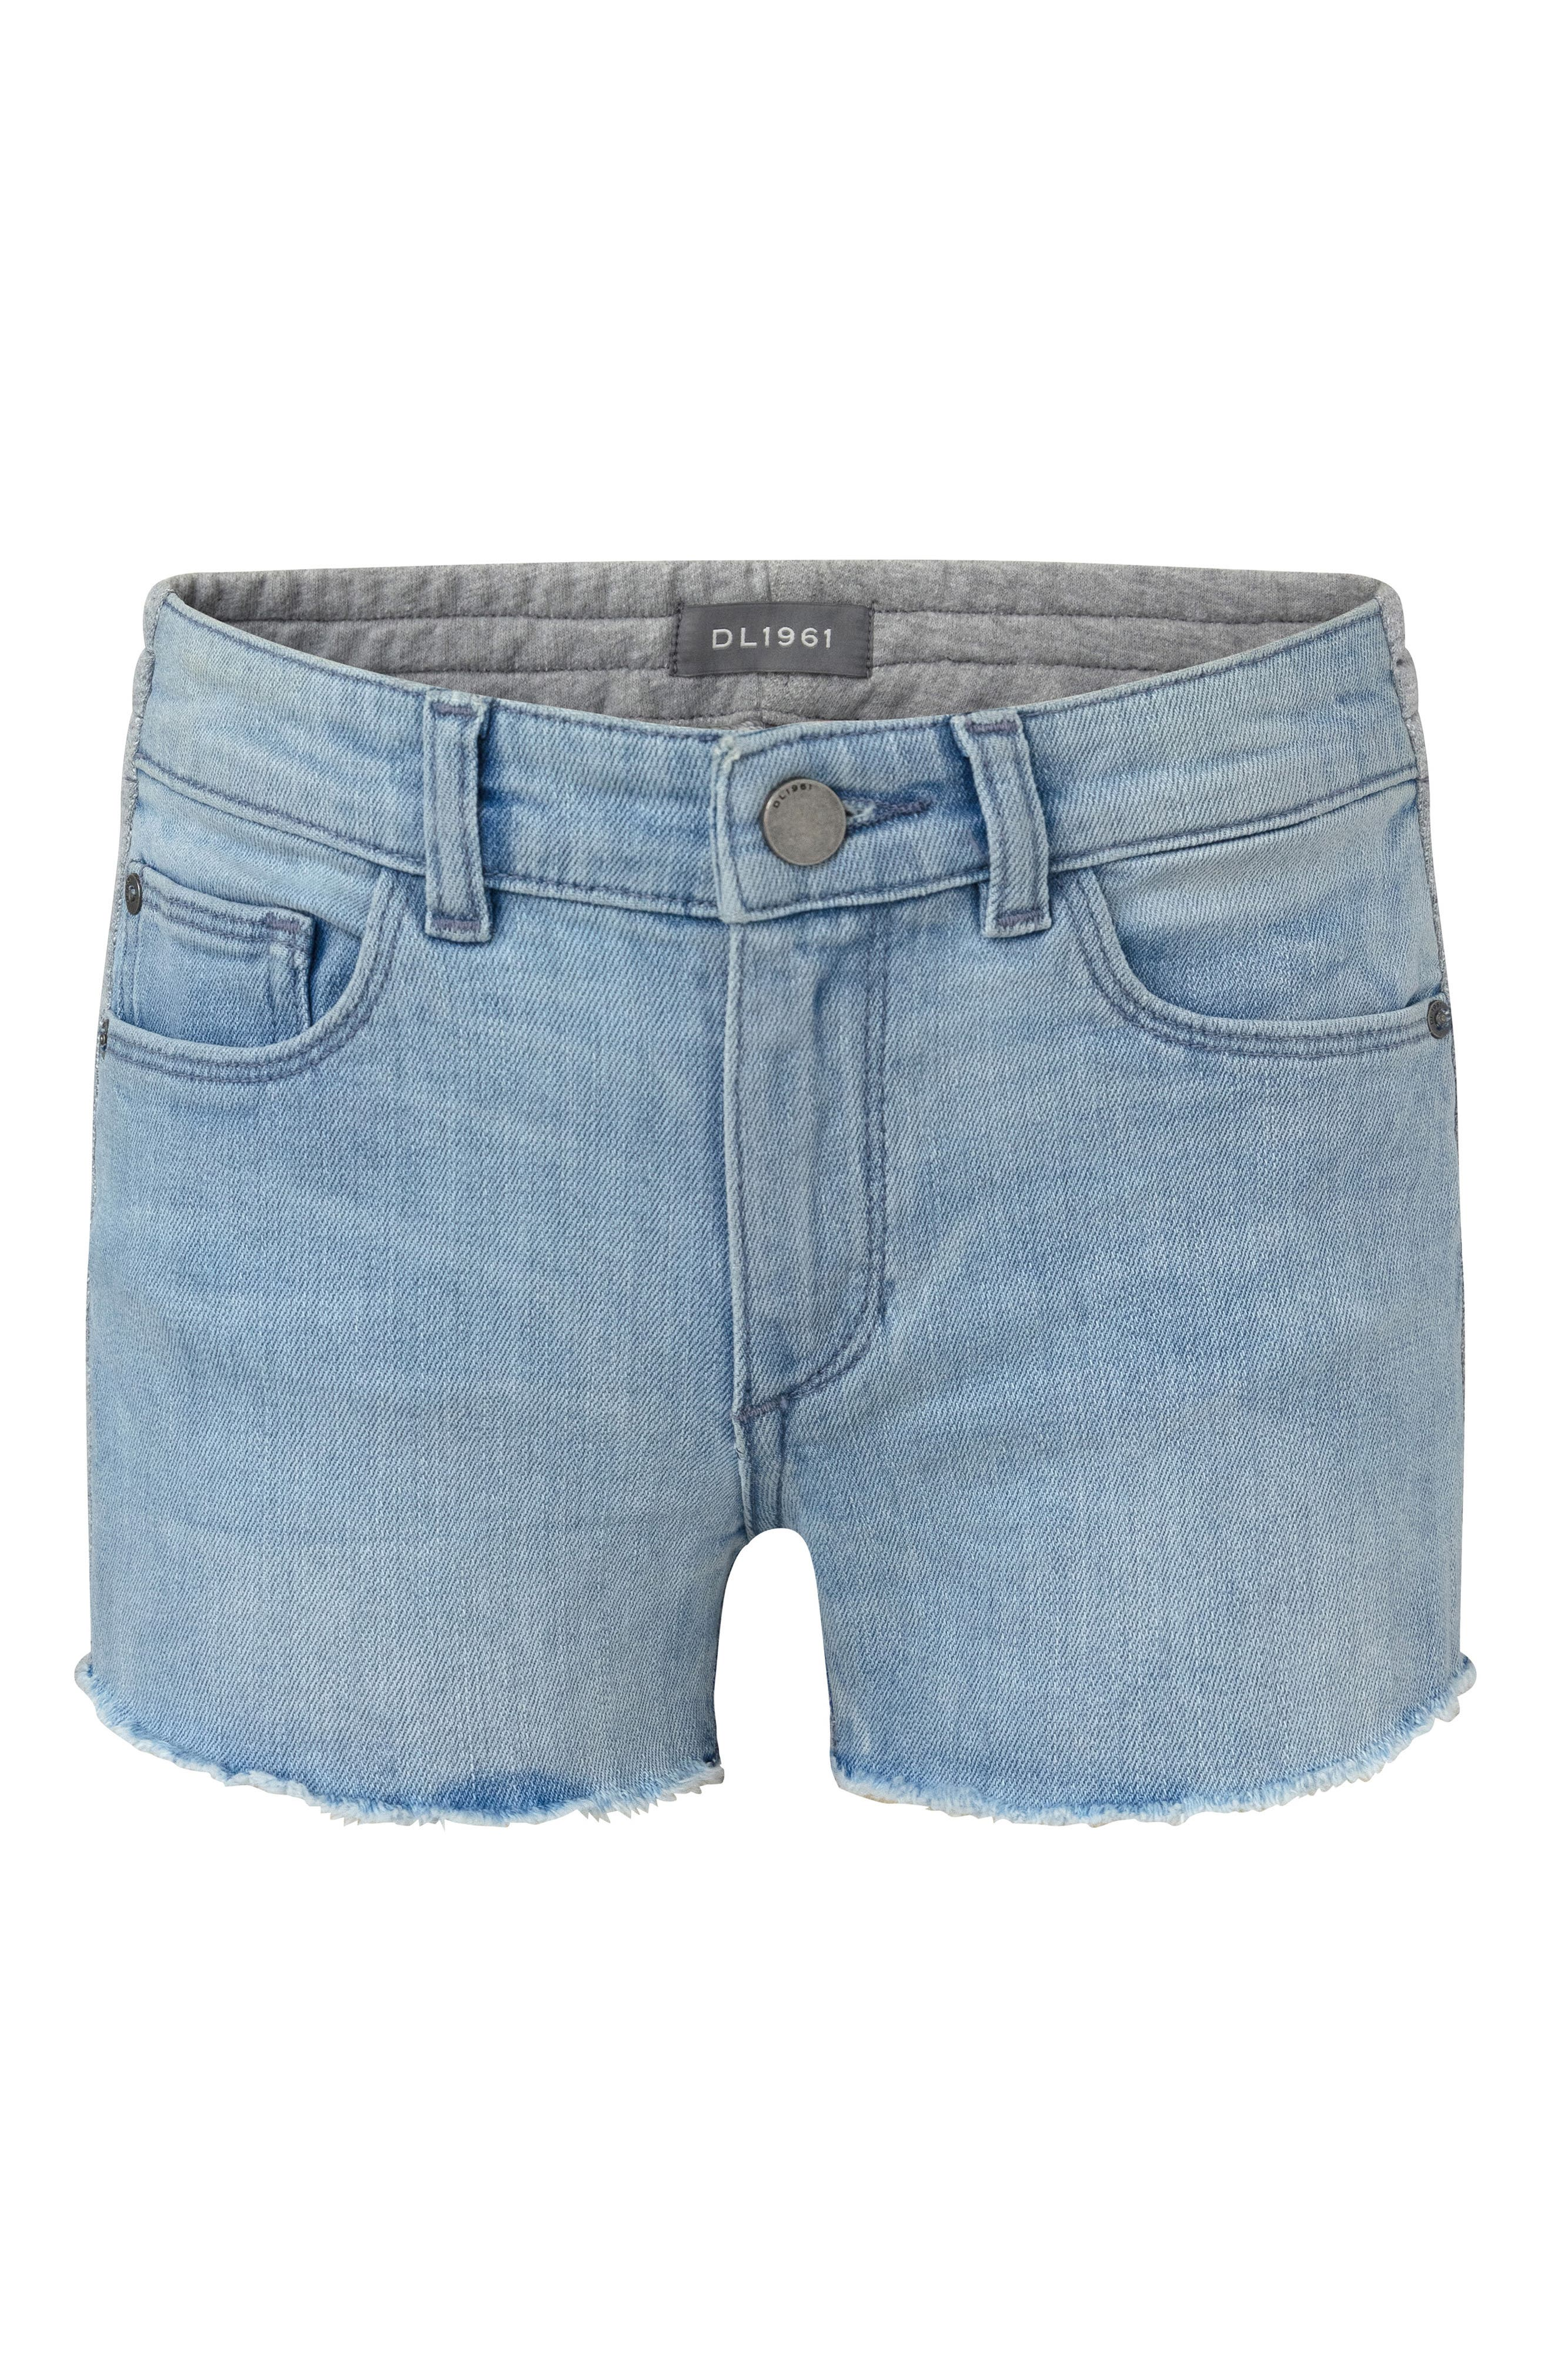 Girls Dl1961 Denimknit Shorts Size 45  Blue